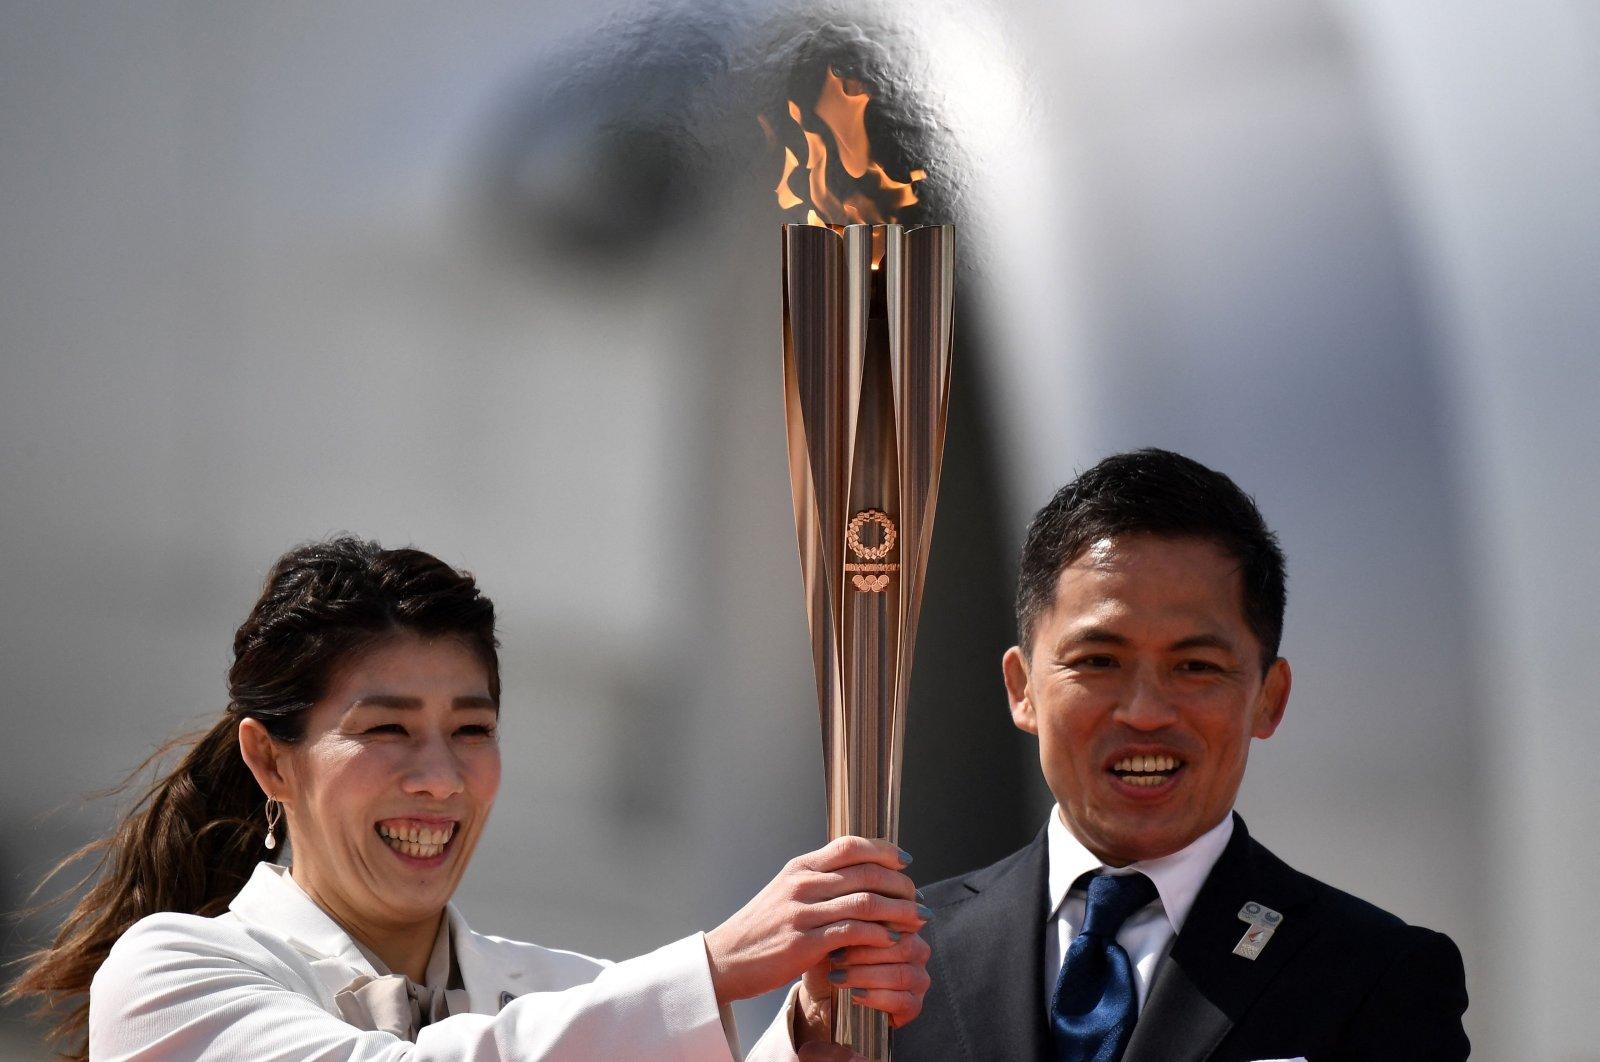 Japanese three-time Olympic gold medallists Saori Yoshida (L) and Tadahiro Nomura (R) holdthe Tokyo 2020 Olympic Torch, Higashimatsushima, Japan, March 20, 2020. (AFP Photo)